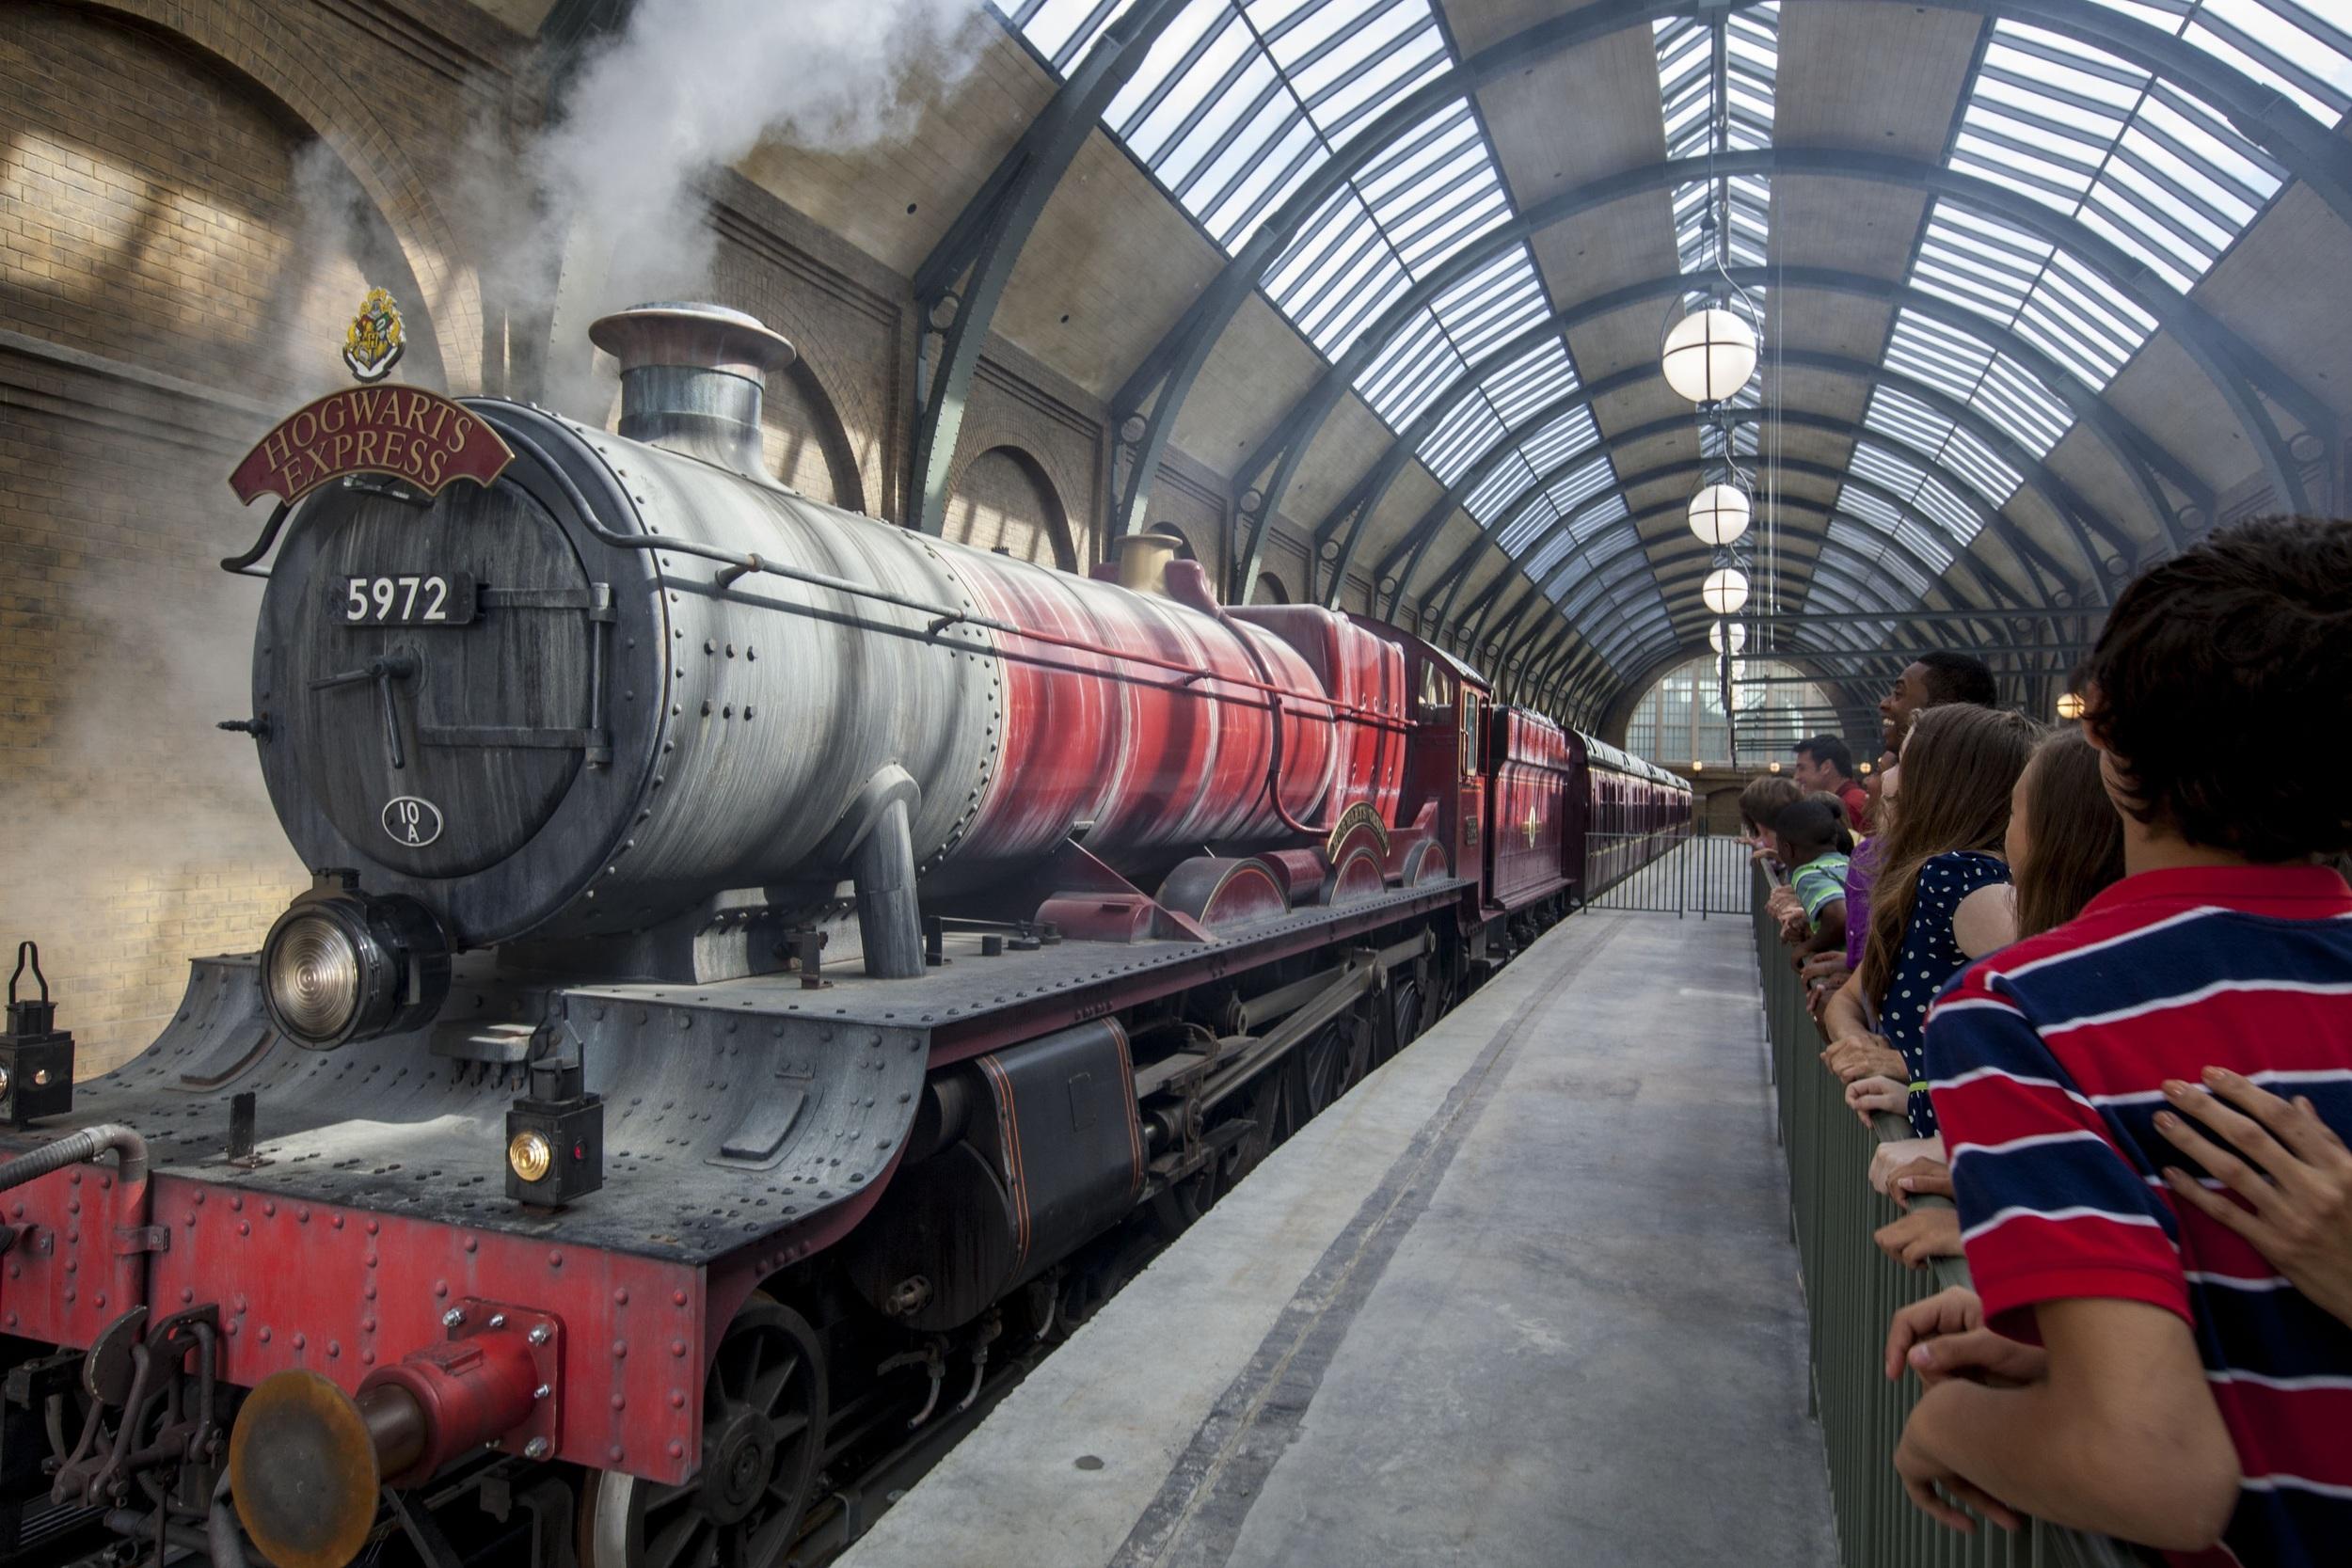 The Hogwarts Express pulling into King's Cross Station.Image Credit: Universal Orlando Resort